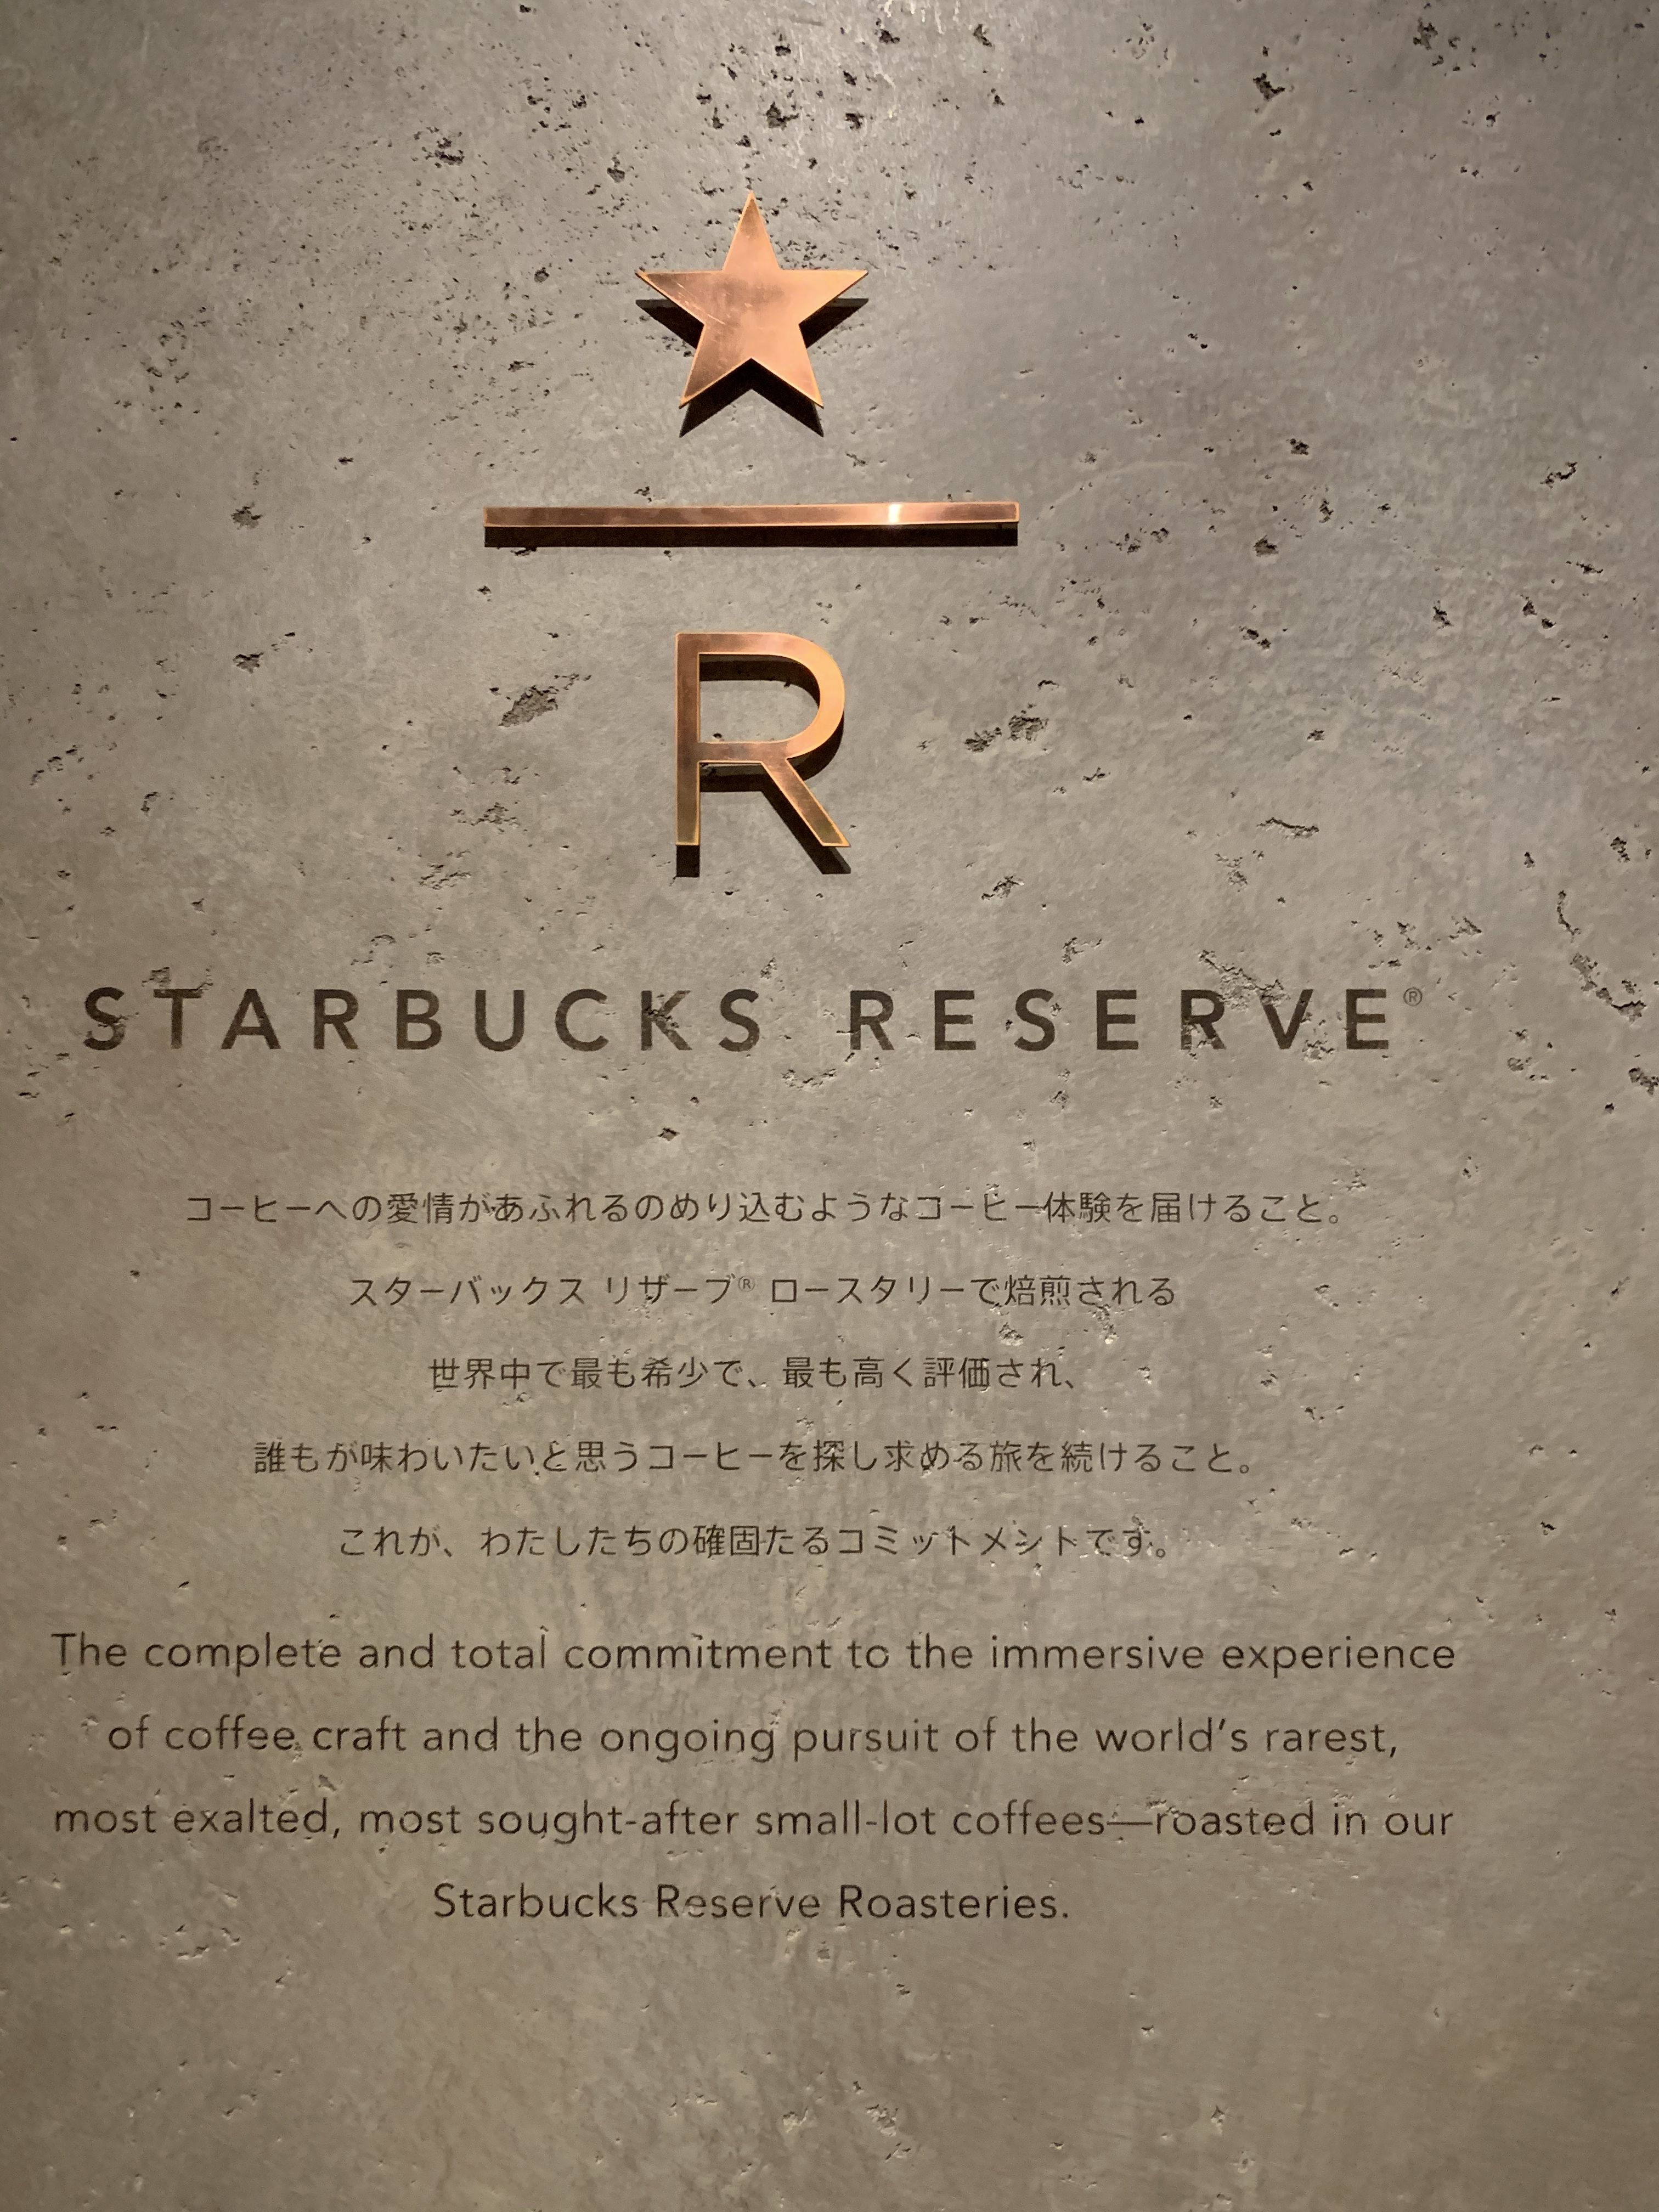 Starbucks Reserve Roastery Tokyo スターバックス コーヒー ジャパン スターバックス スターバックス リザーブ コーヒー